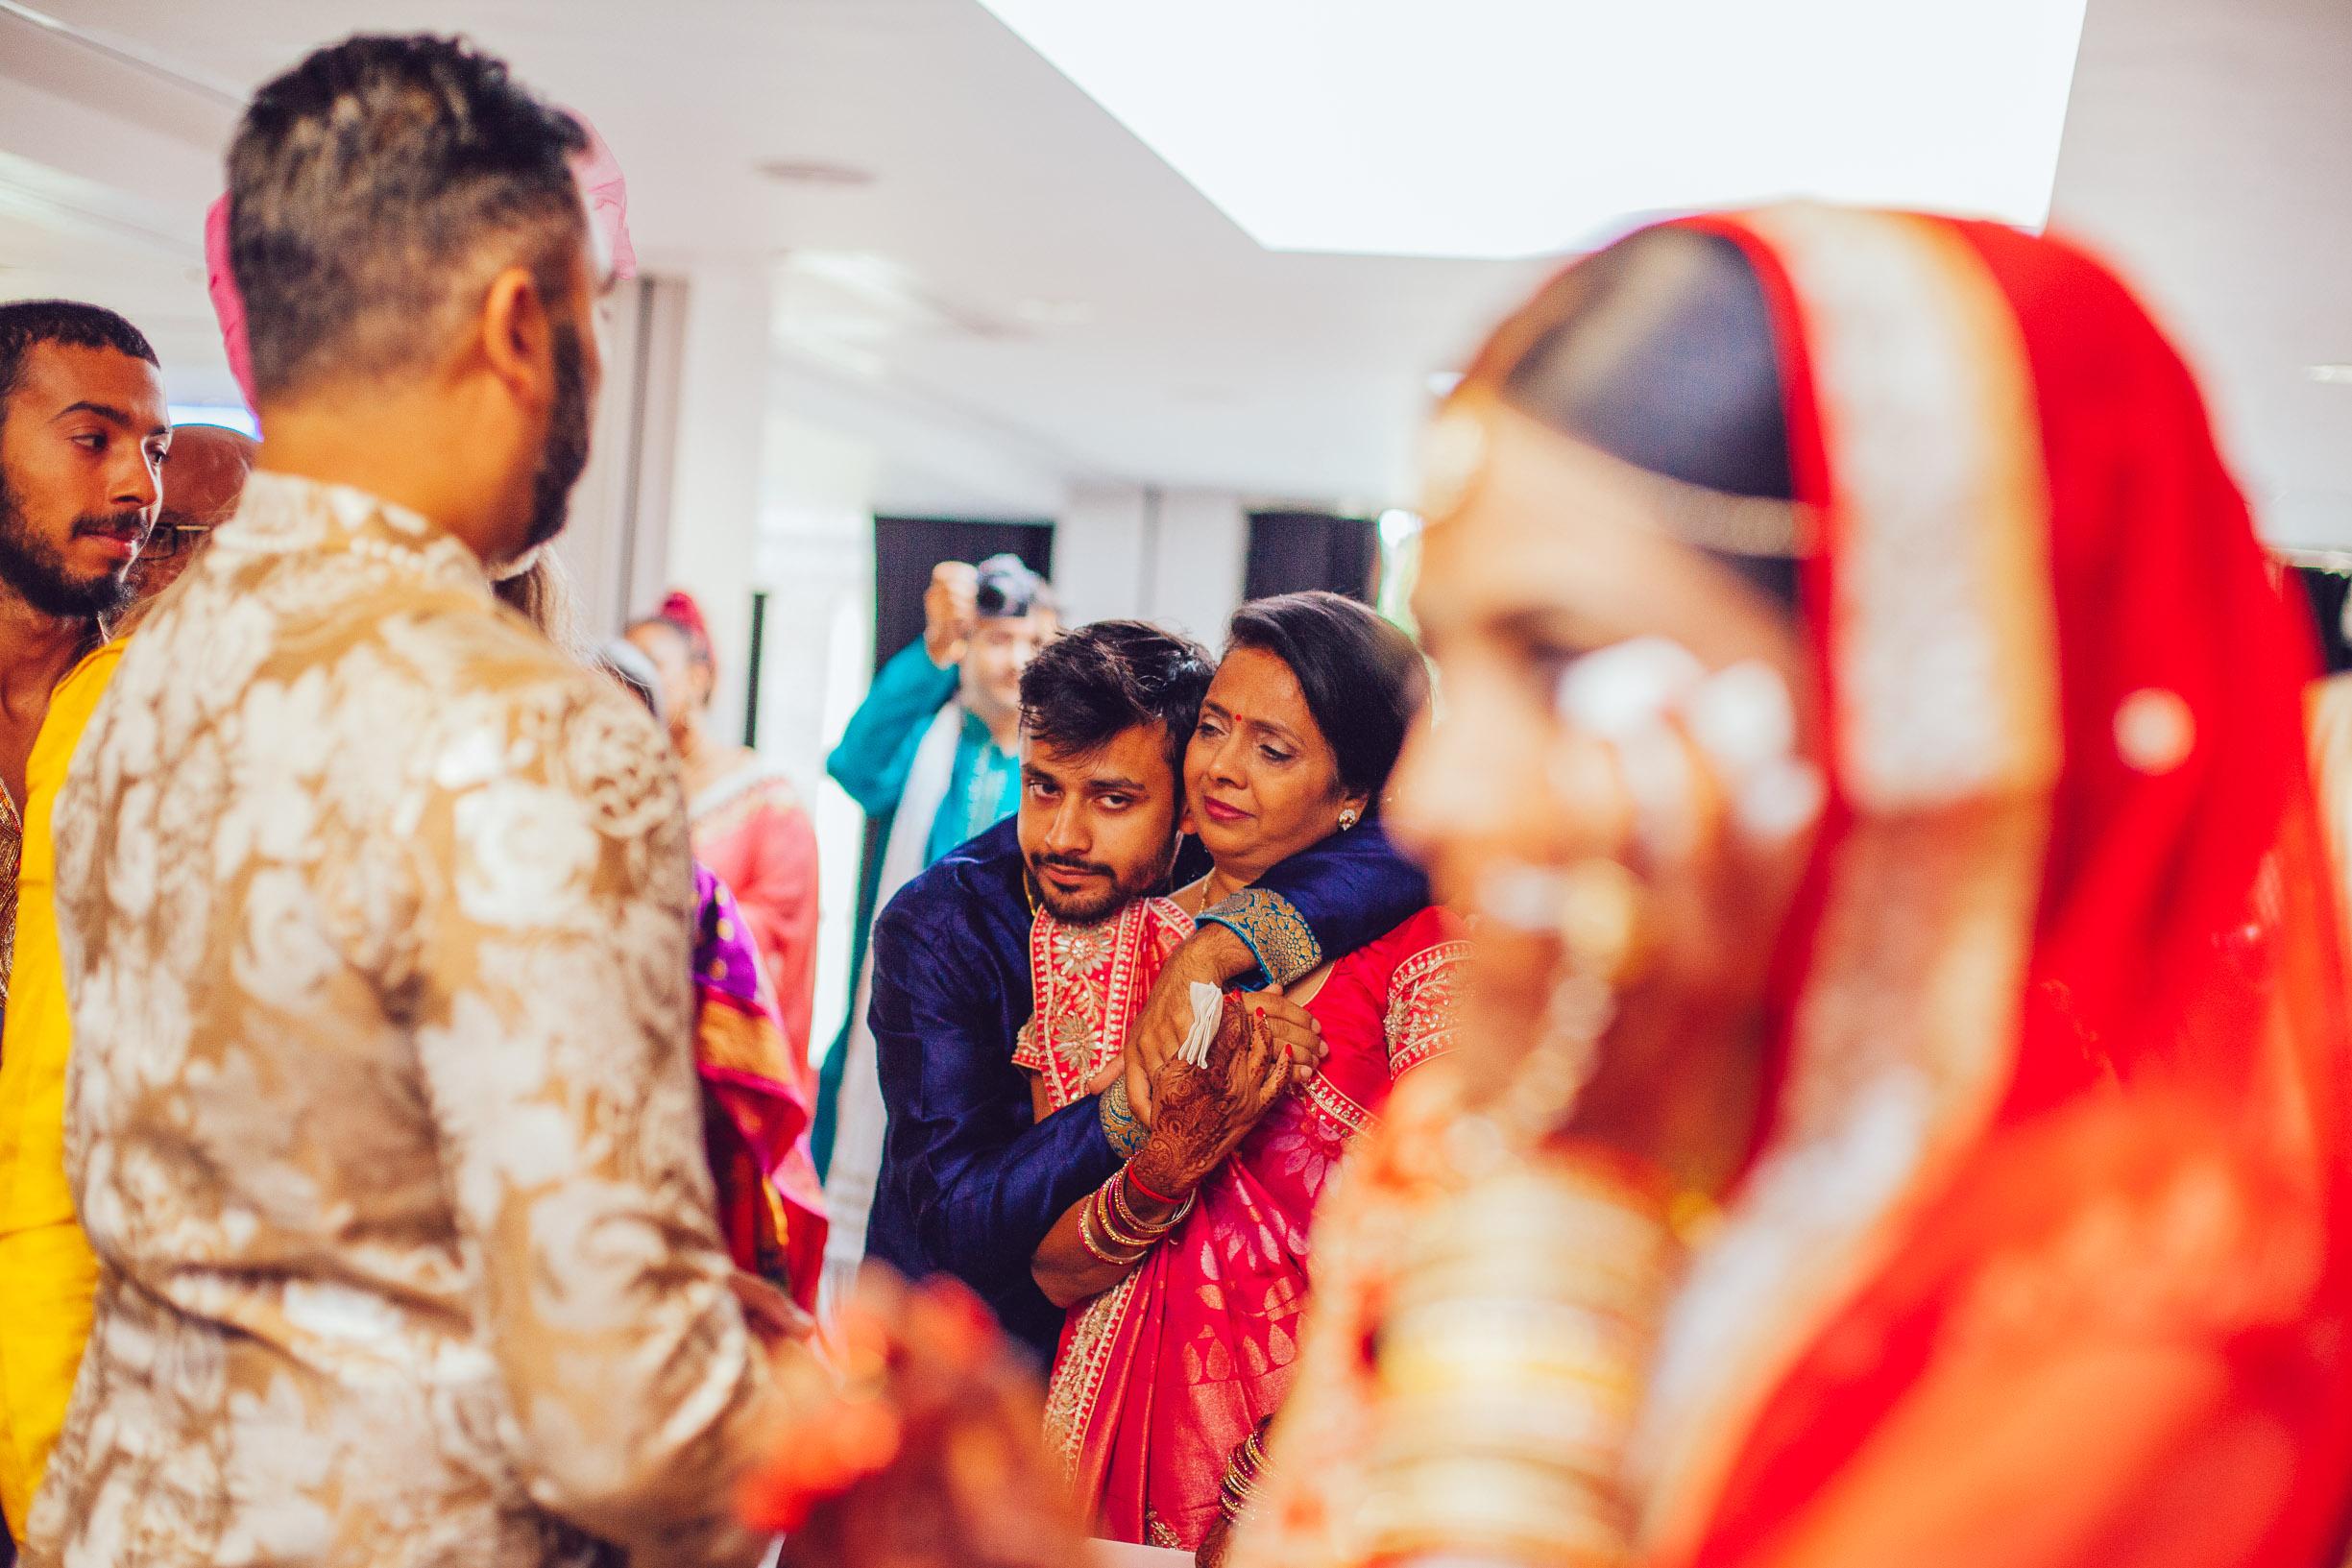 amit&ceema_eden_moments_wedding_photography-24